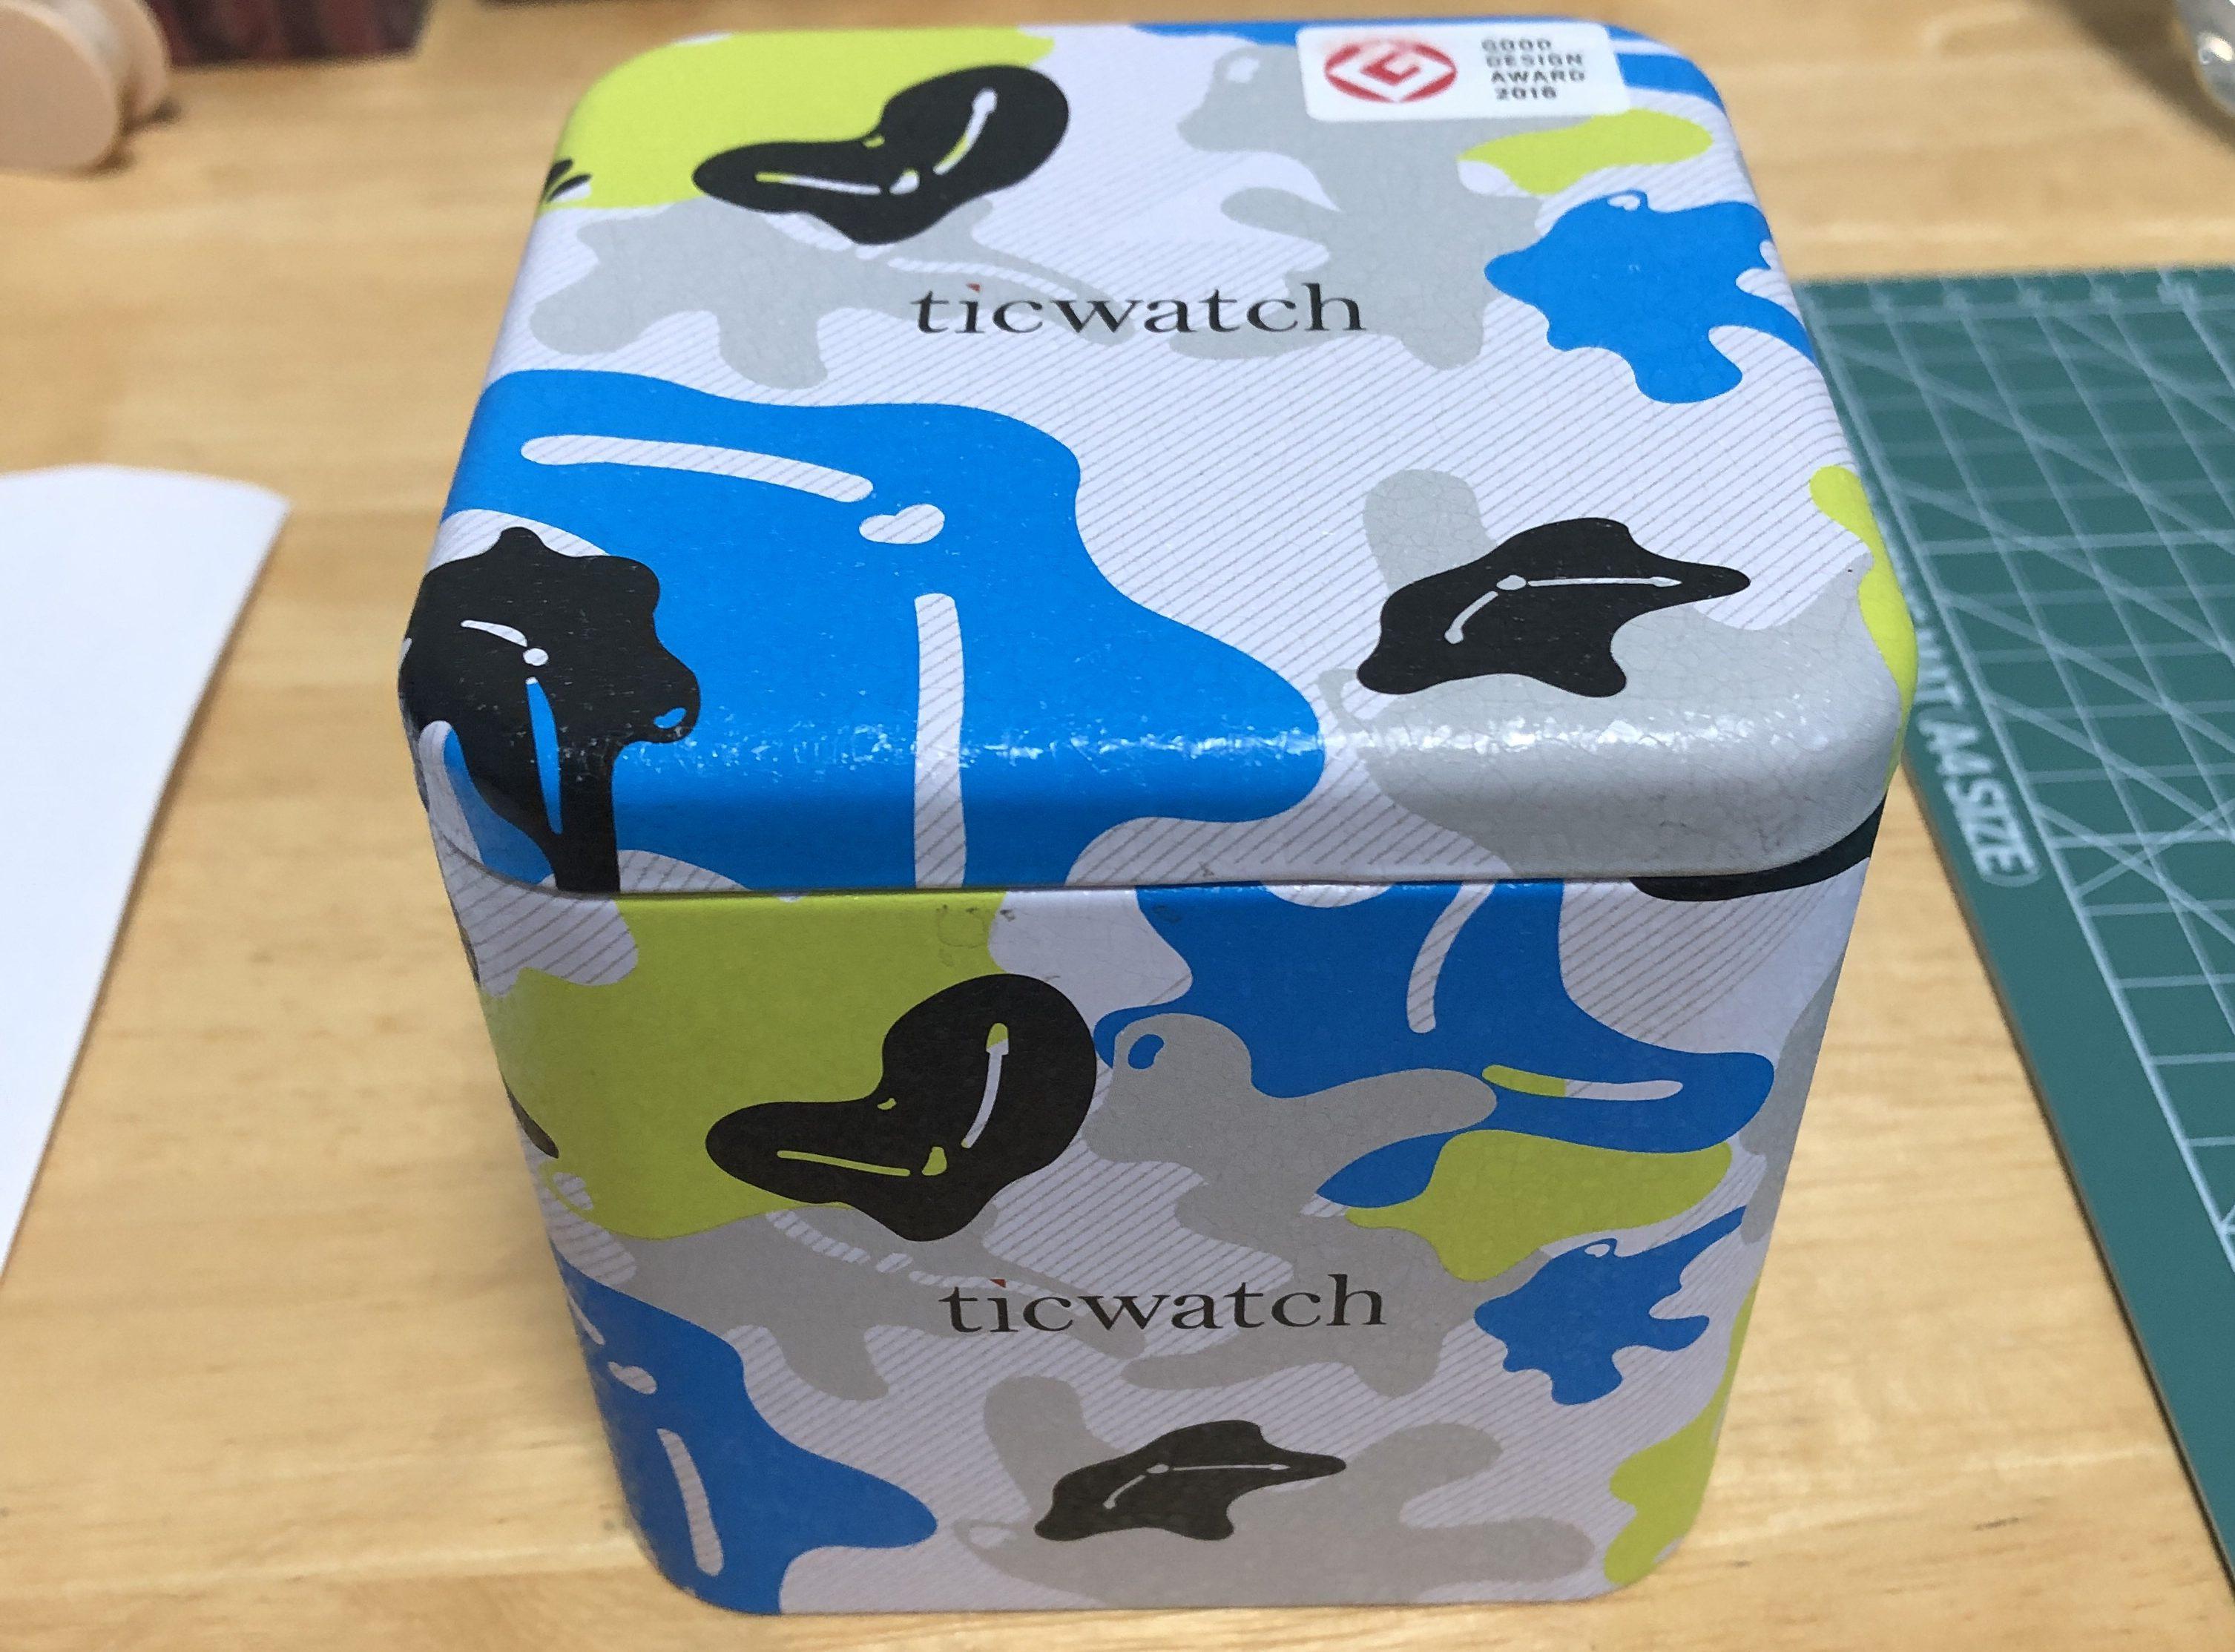 ticwatchの箱画像